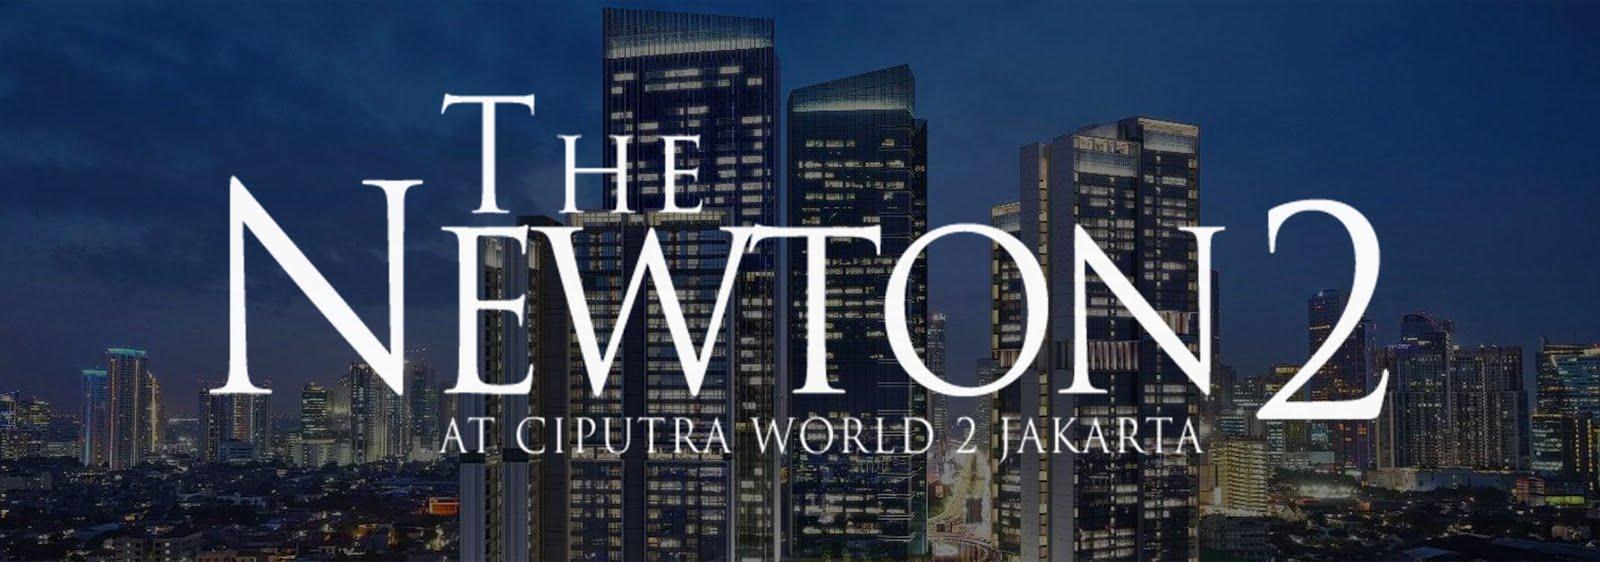 Apartemen The Newton 2 Ciputra World 2 Kuningan